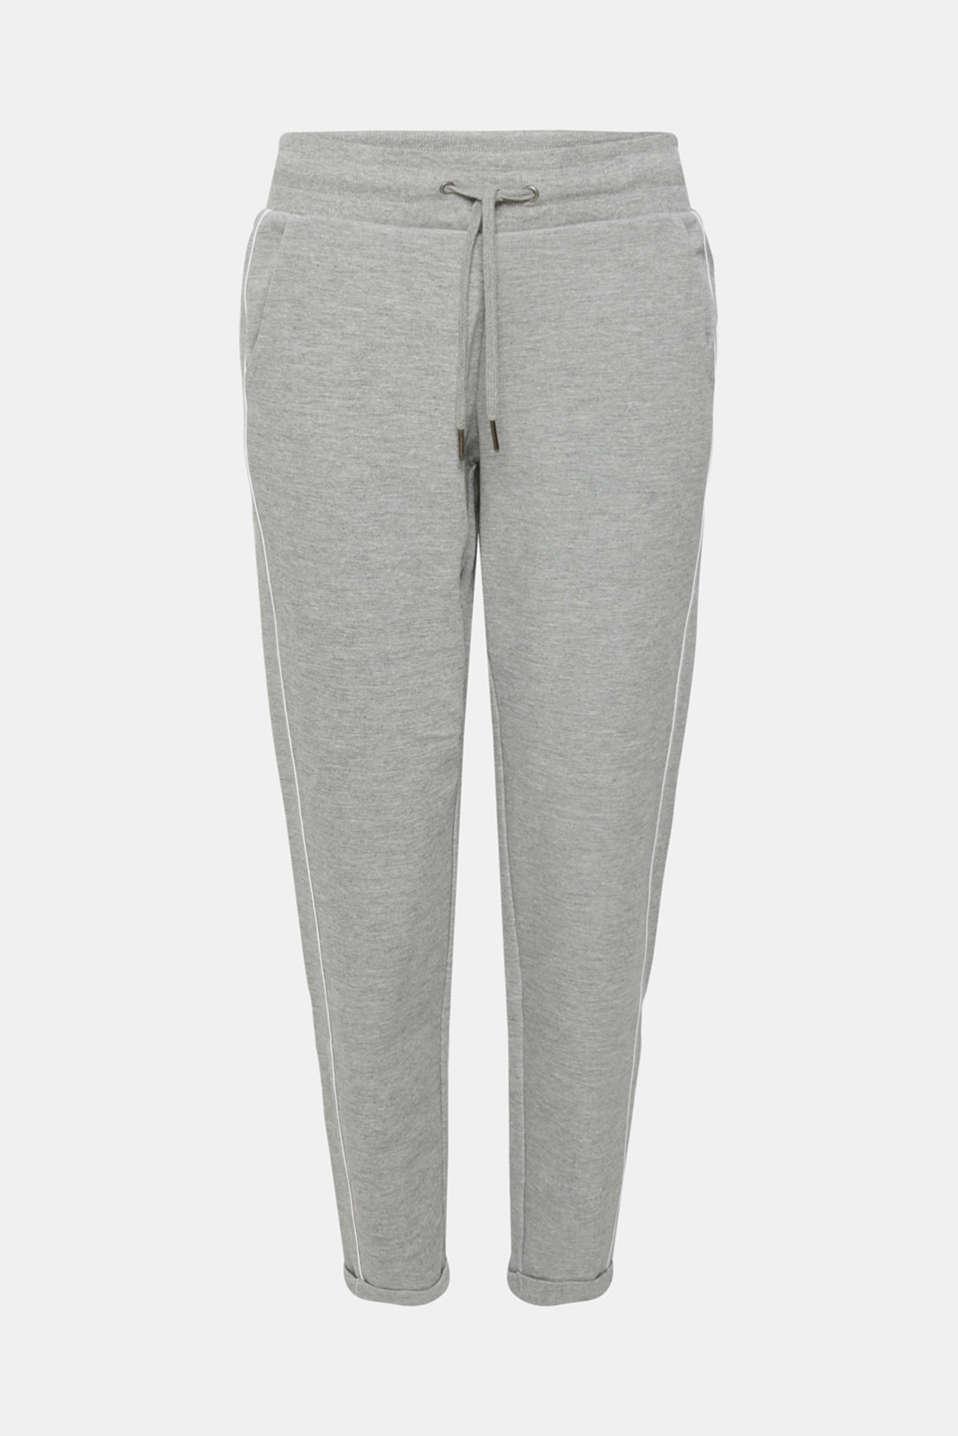 Pants knitted, MEDIUM GREY 2, detail image number 7